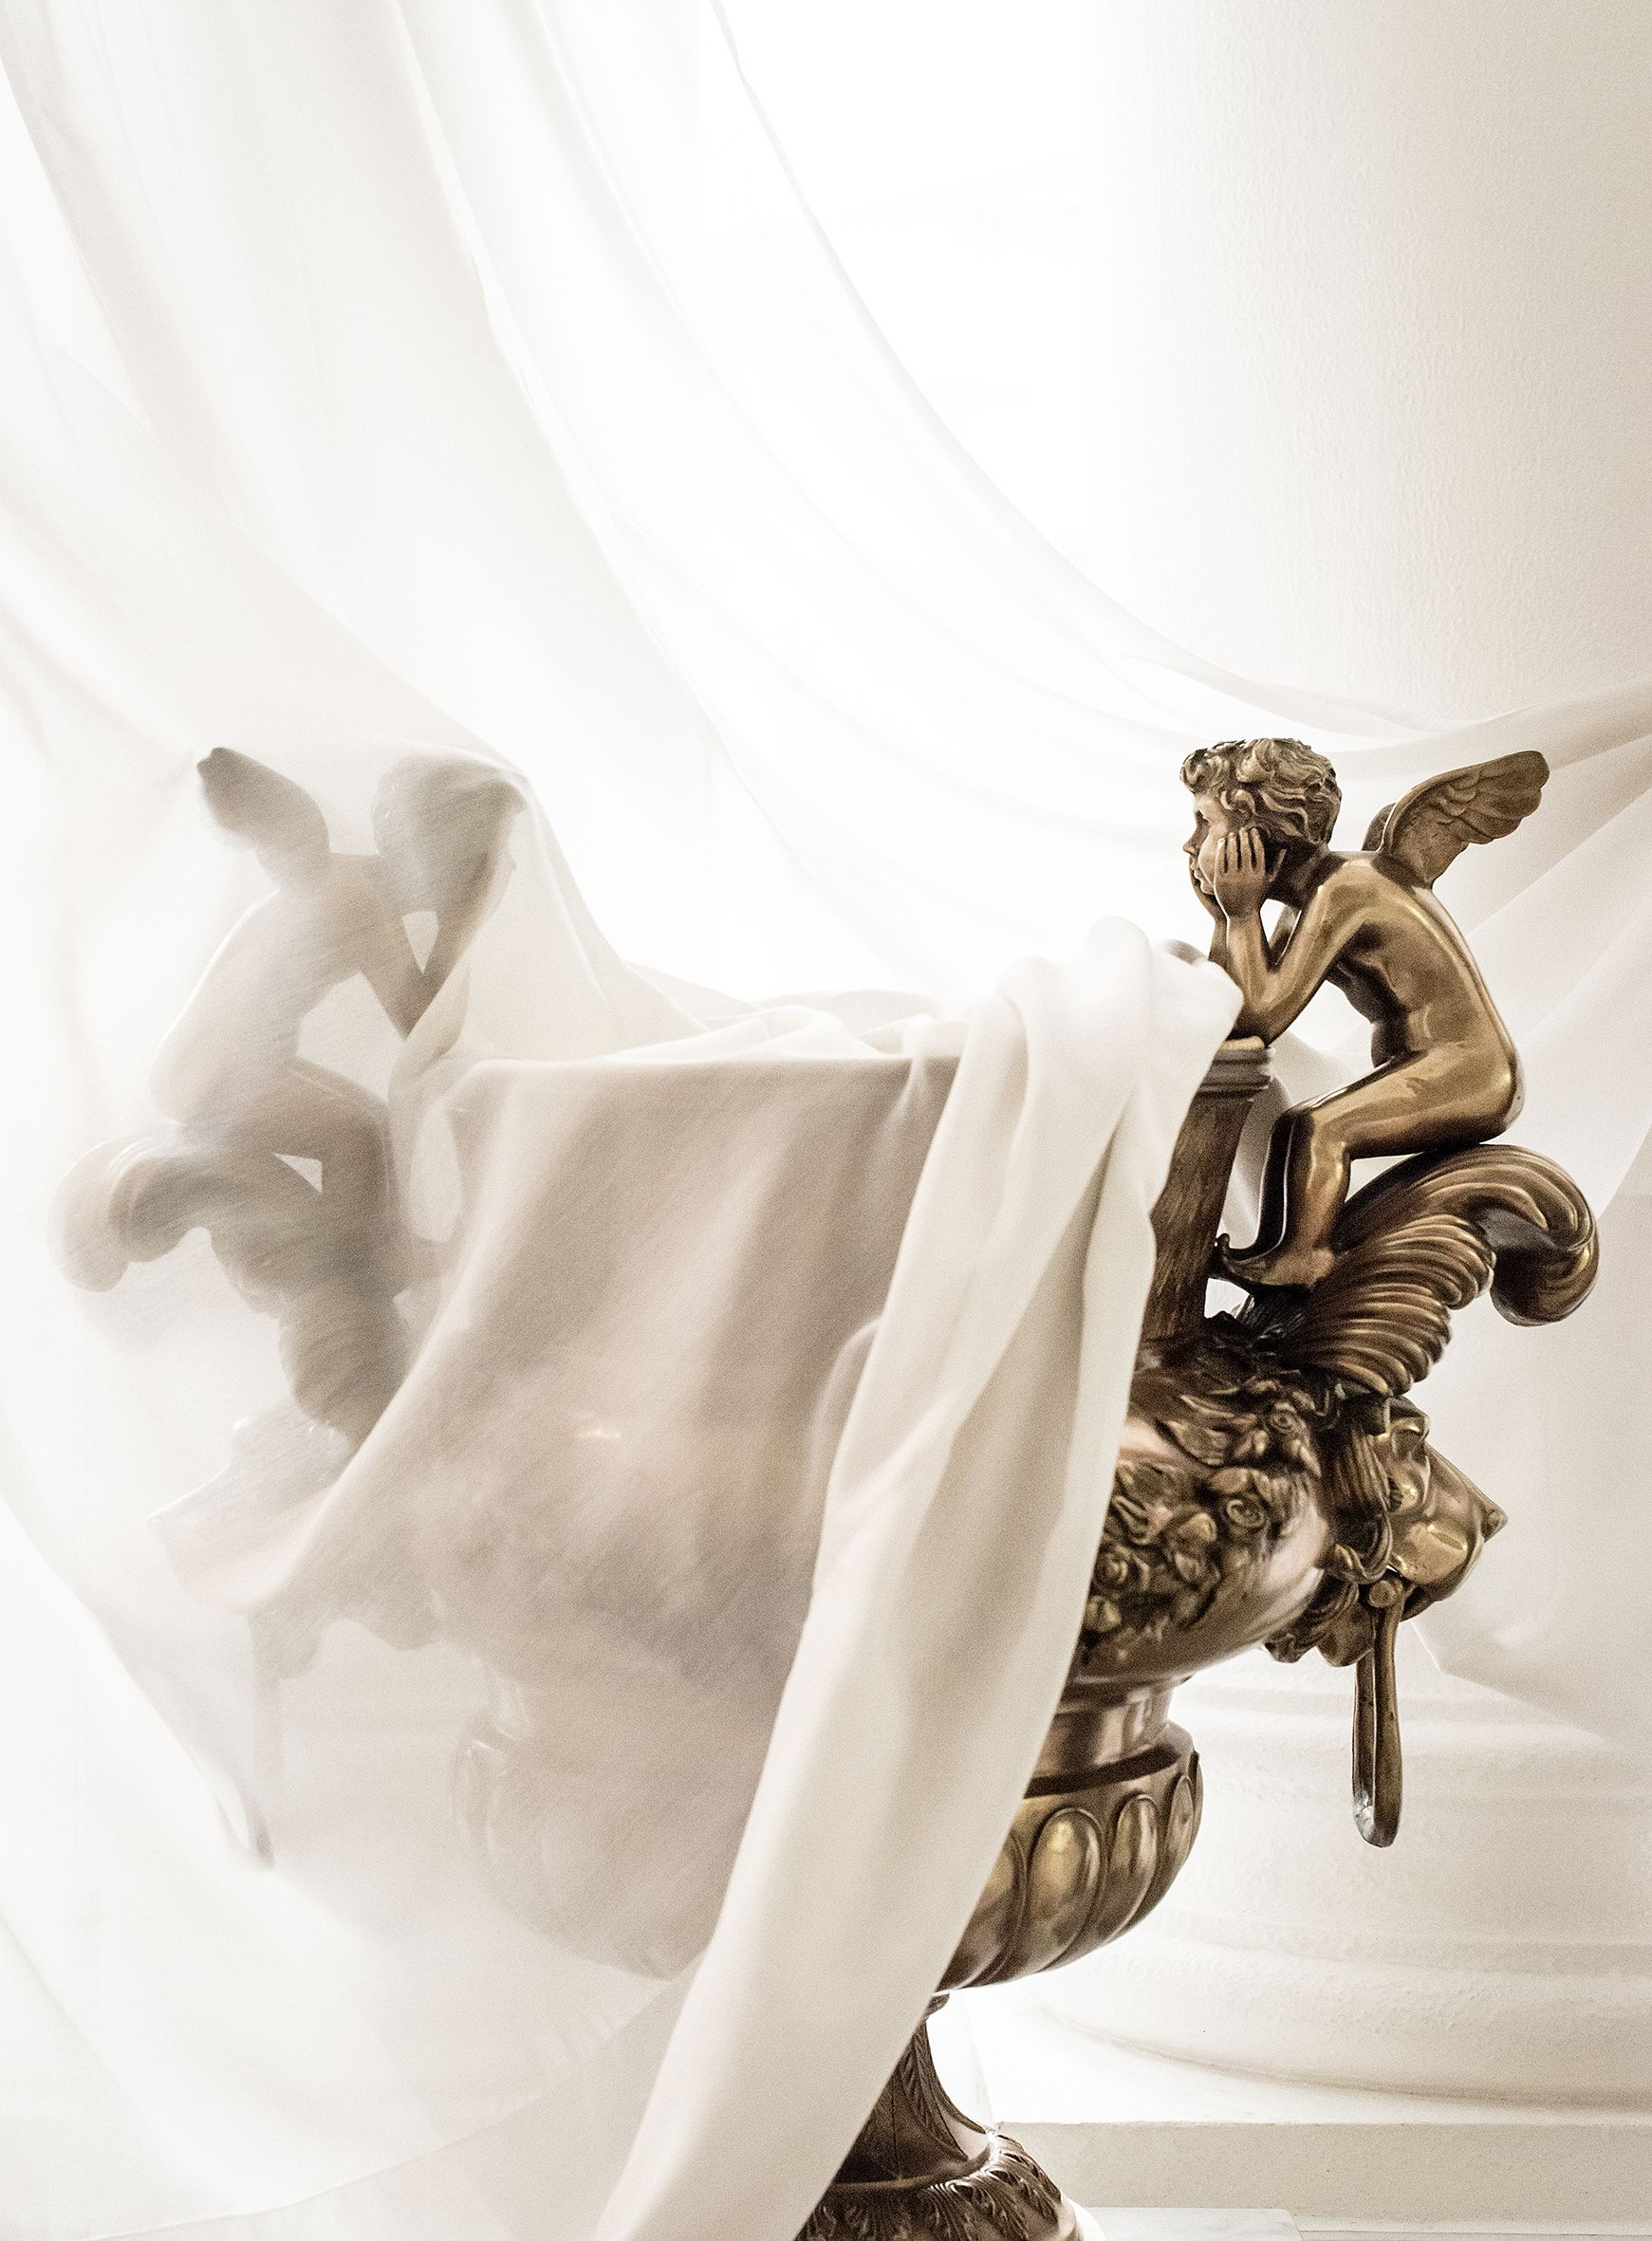 Petits anges du Negresco - Little #angels from the Negresco